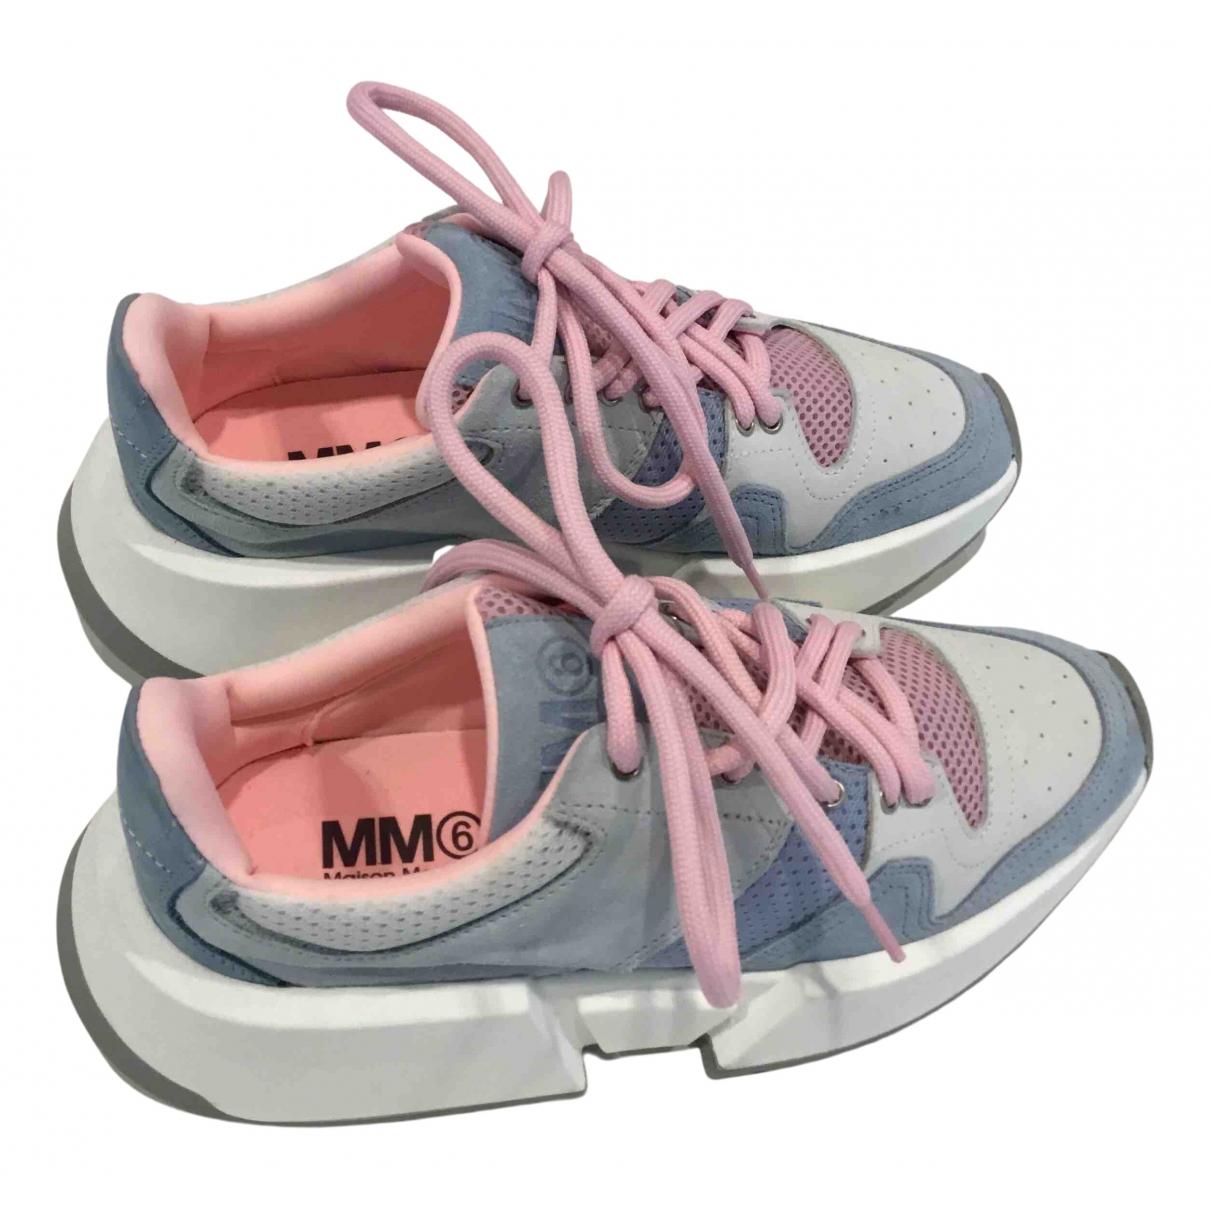 Mm6 - Baskets   pour femme - rose